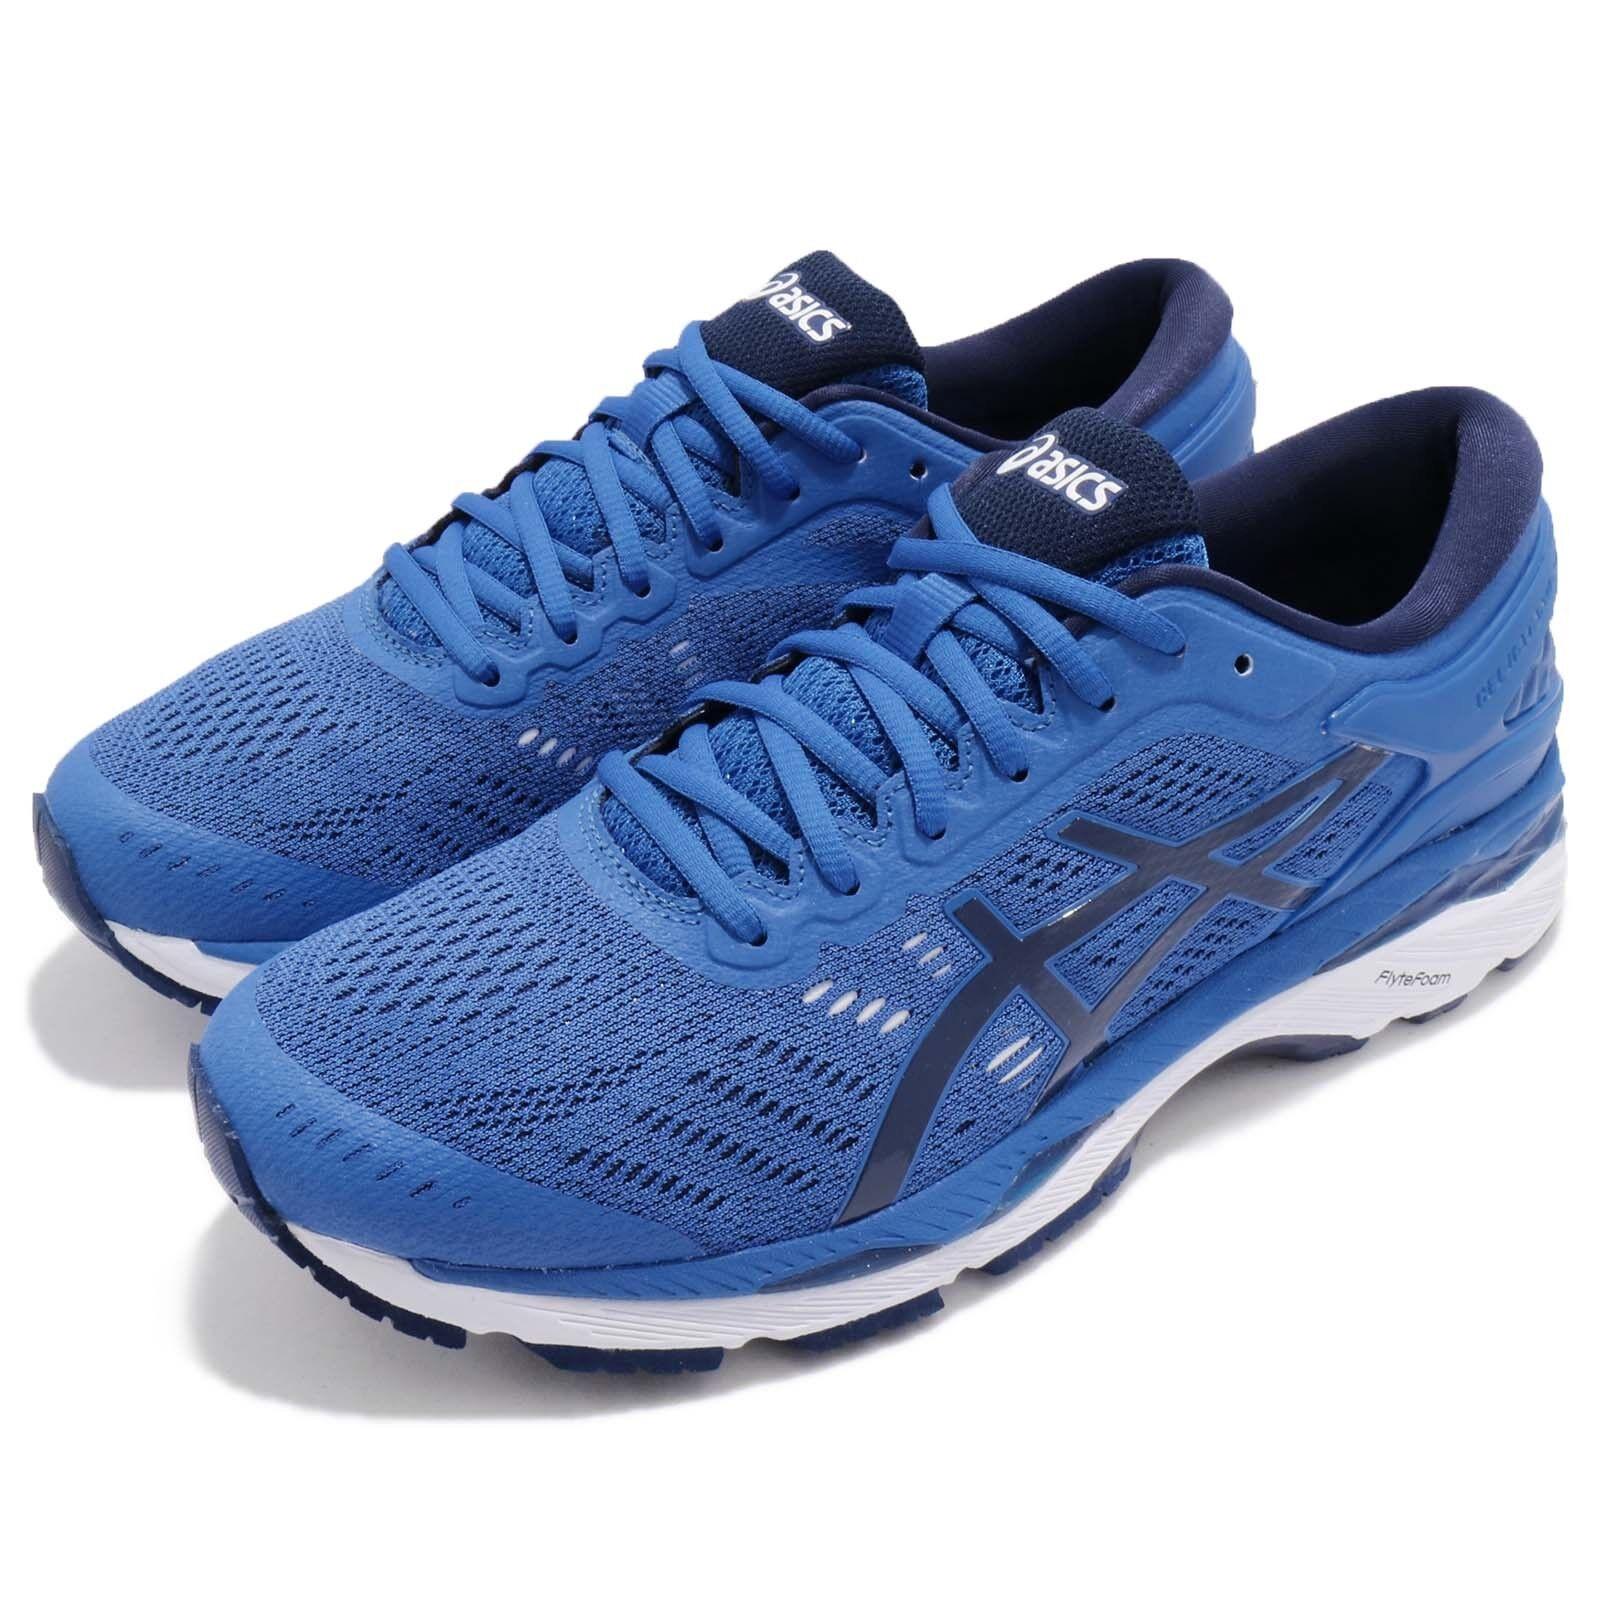 Asics Gel-Kayano 24 Bleu Noir Blanc Homme Road Running Chaussures Sneakers T749N-4549